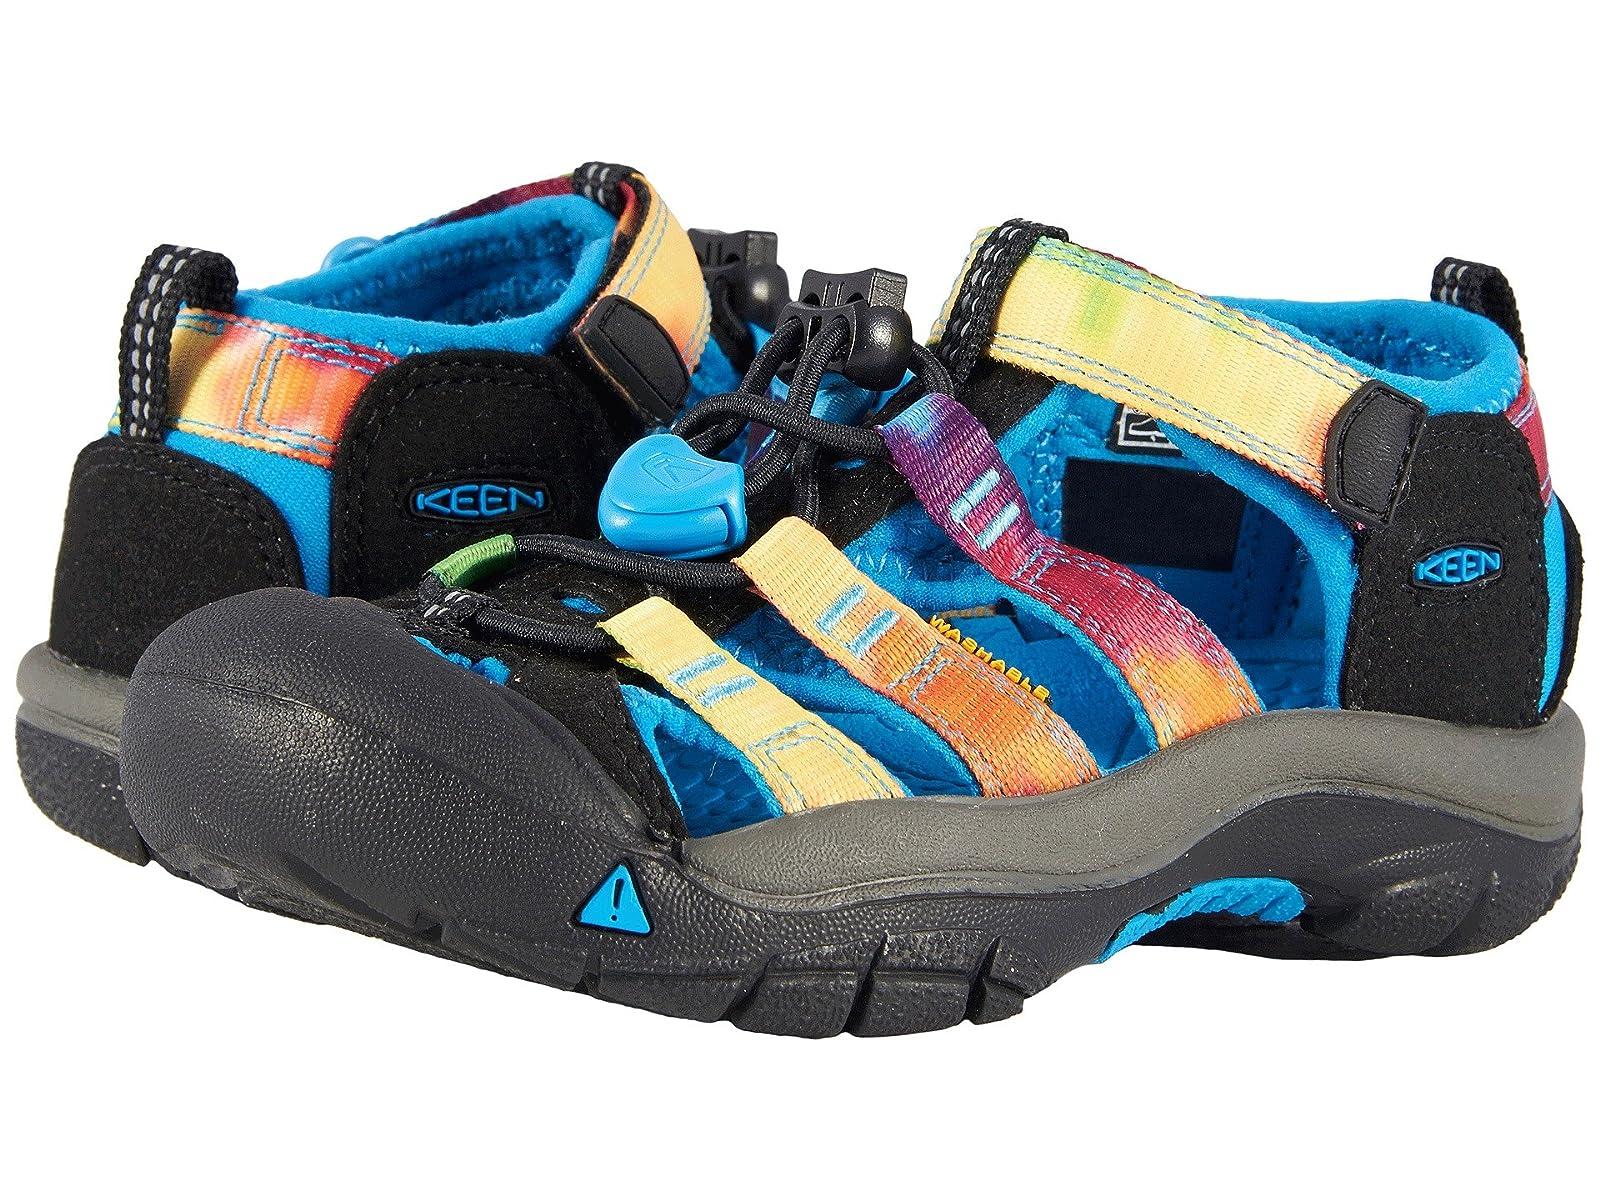 Keen Kids Newport H2 (Toddler/Little Kid)Atmospheric grades have affordable shoes